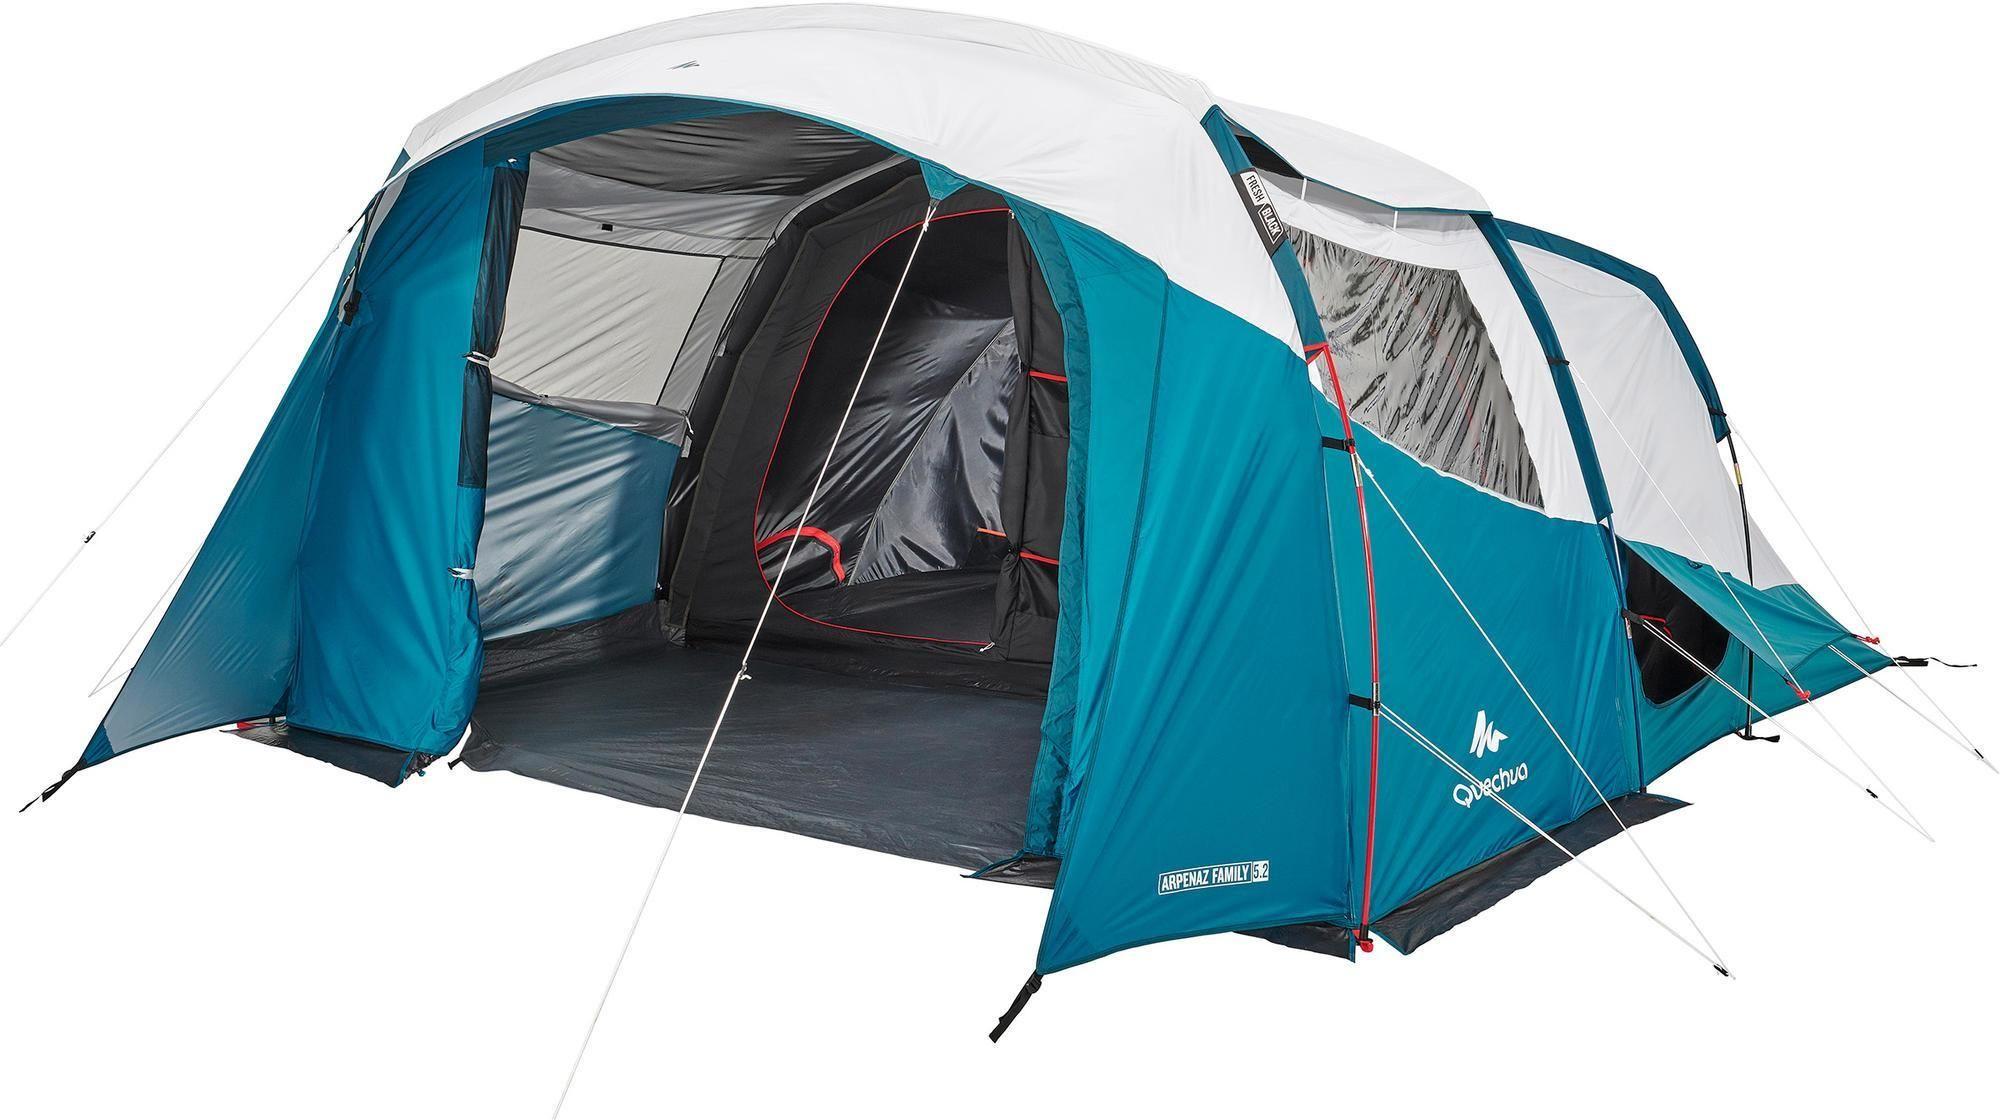 Namiot kempingowy Quechua Arpenaz 5.2 F&B -5-osobowy, -2 sypialnie